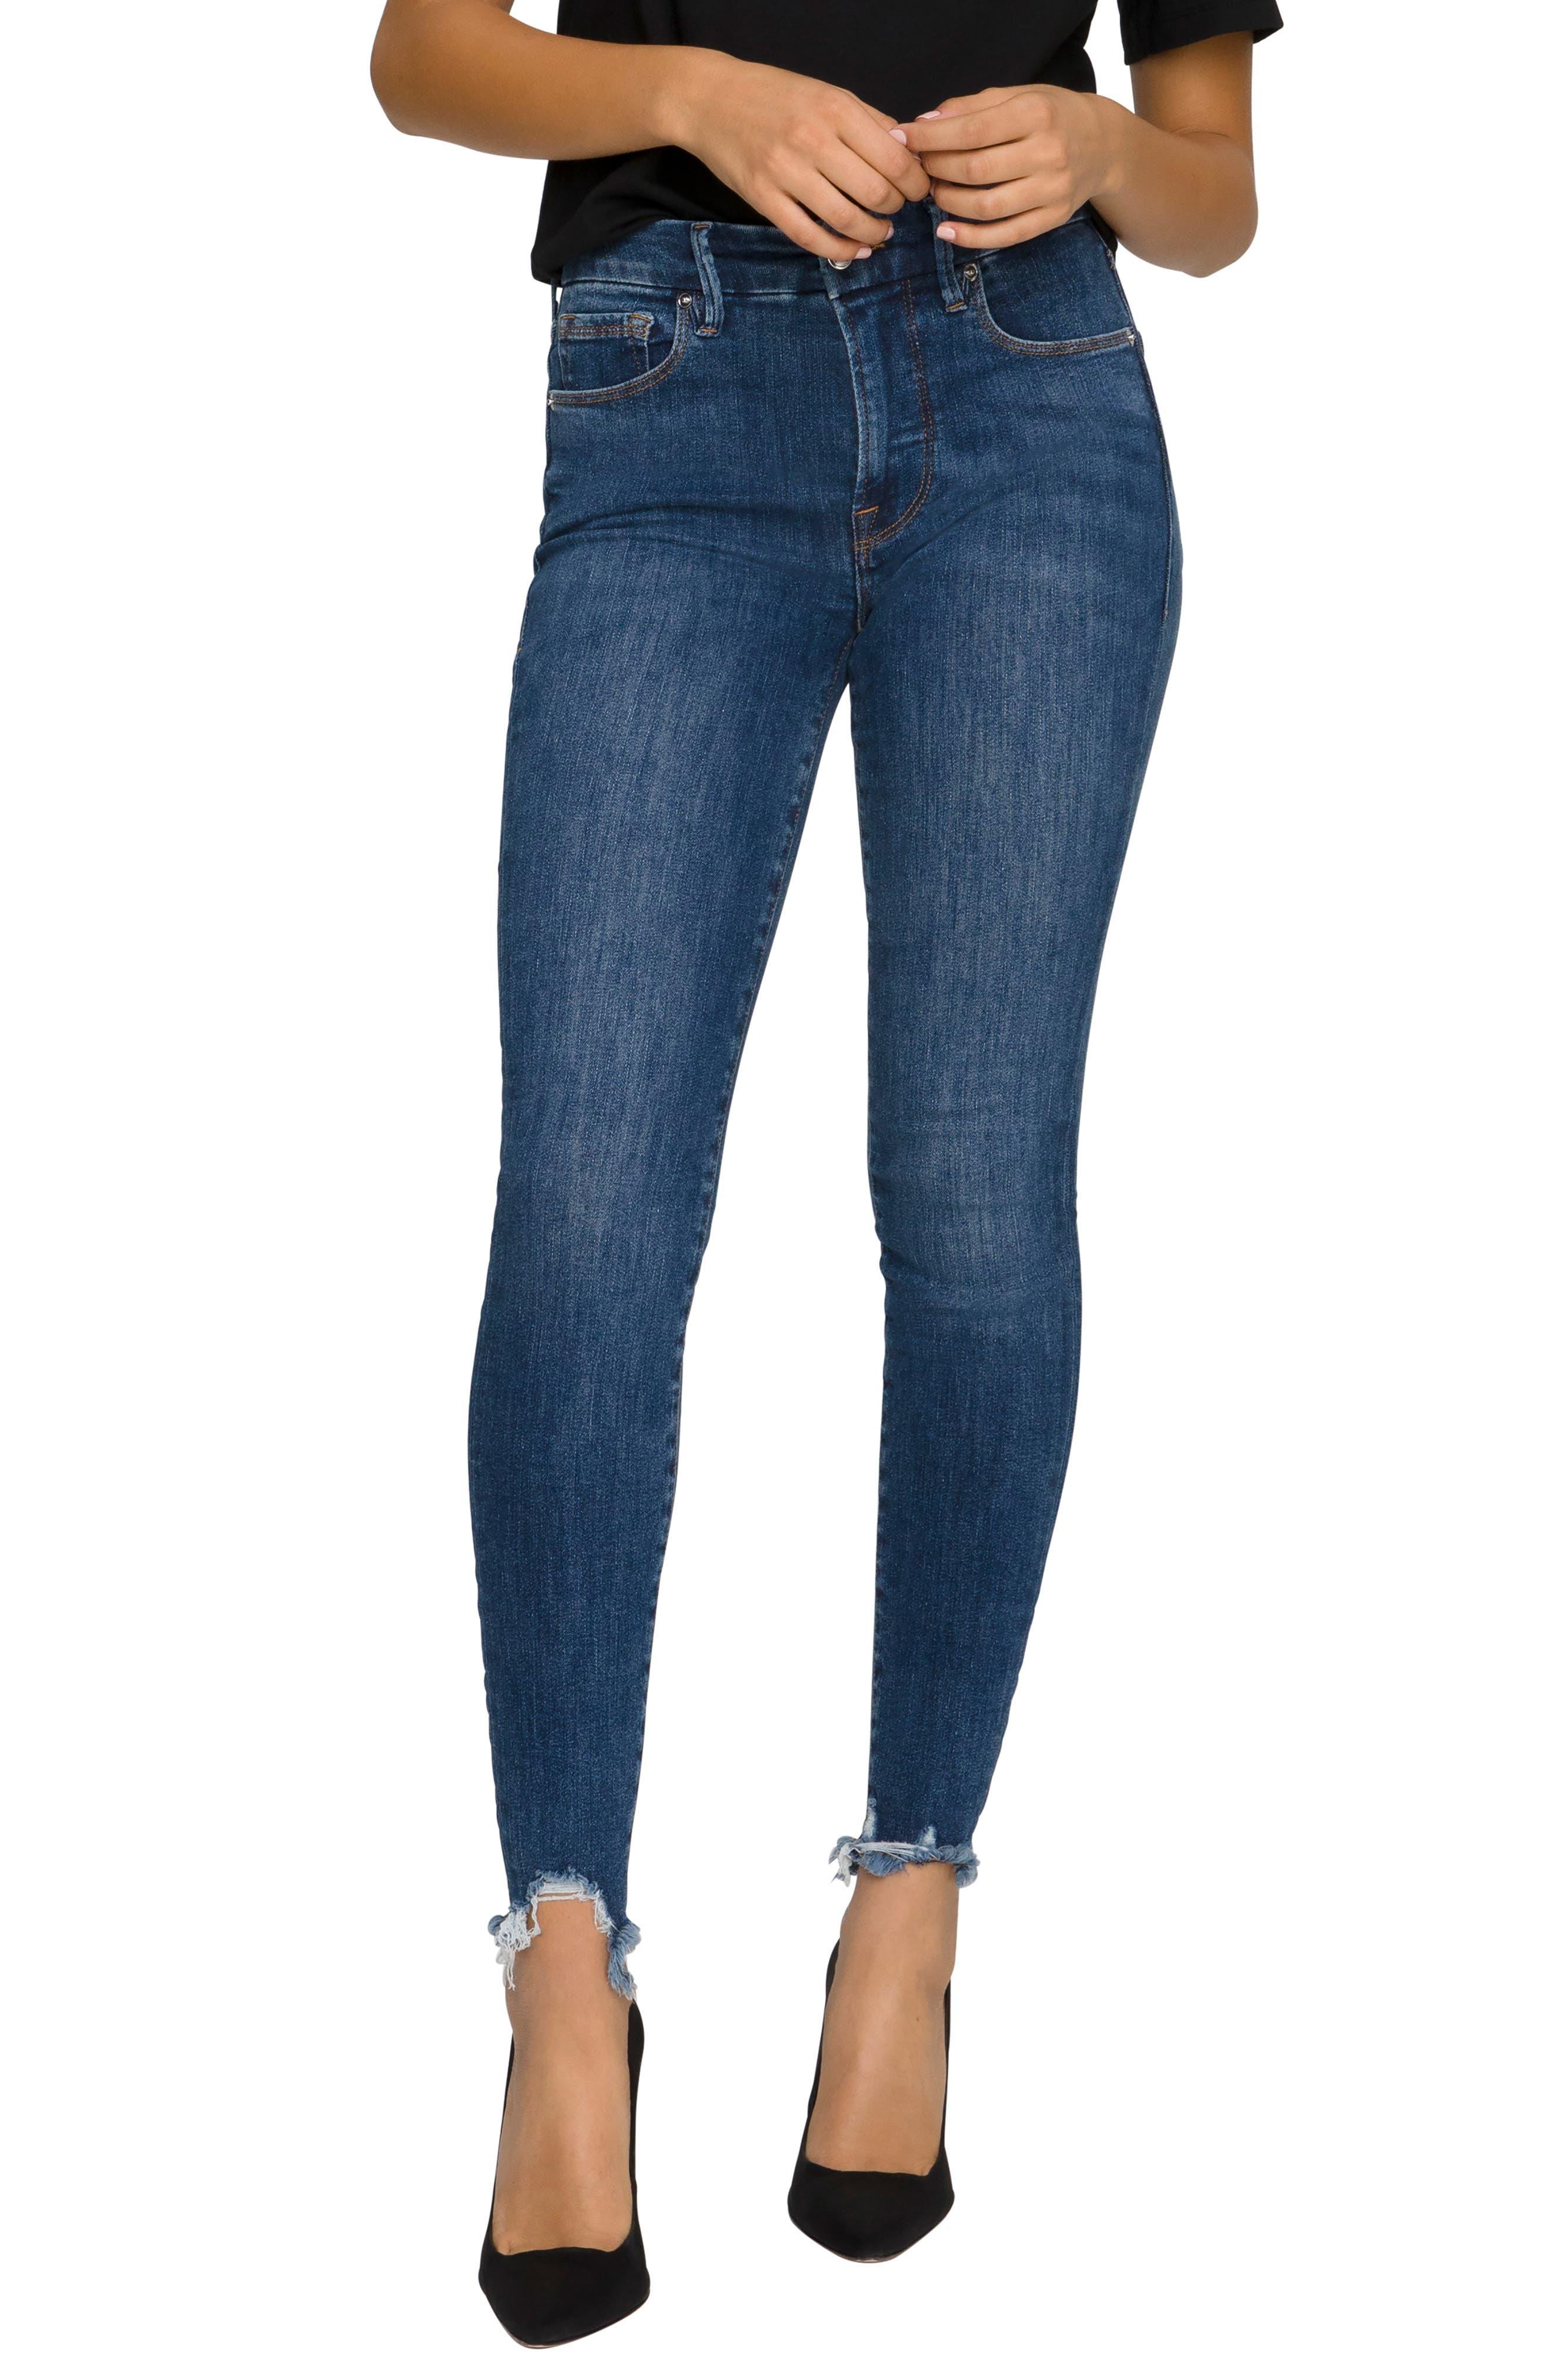 Good Legs Ripped Hem High Waist Skinny Jeans